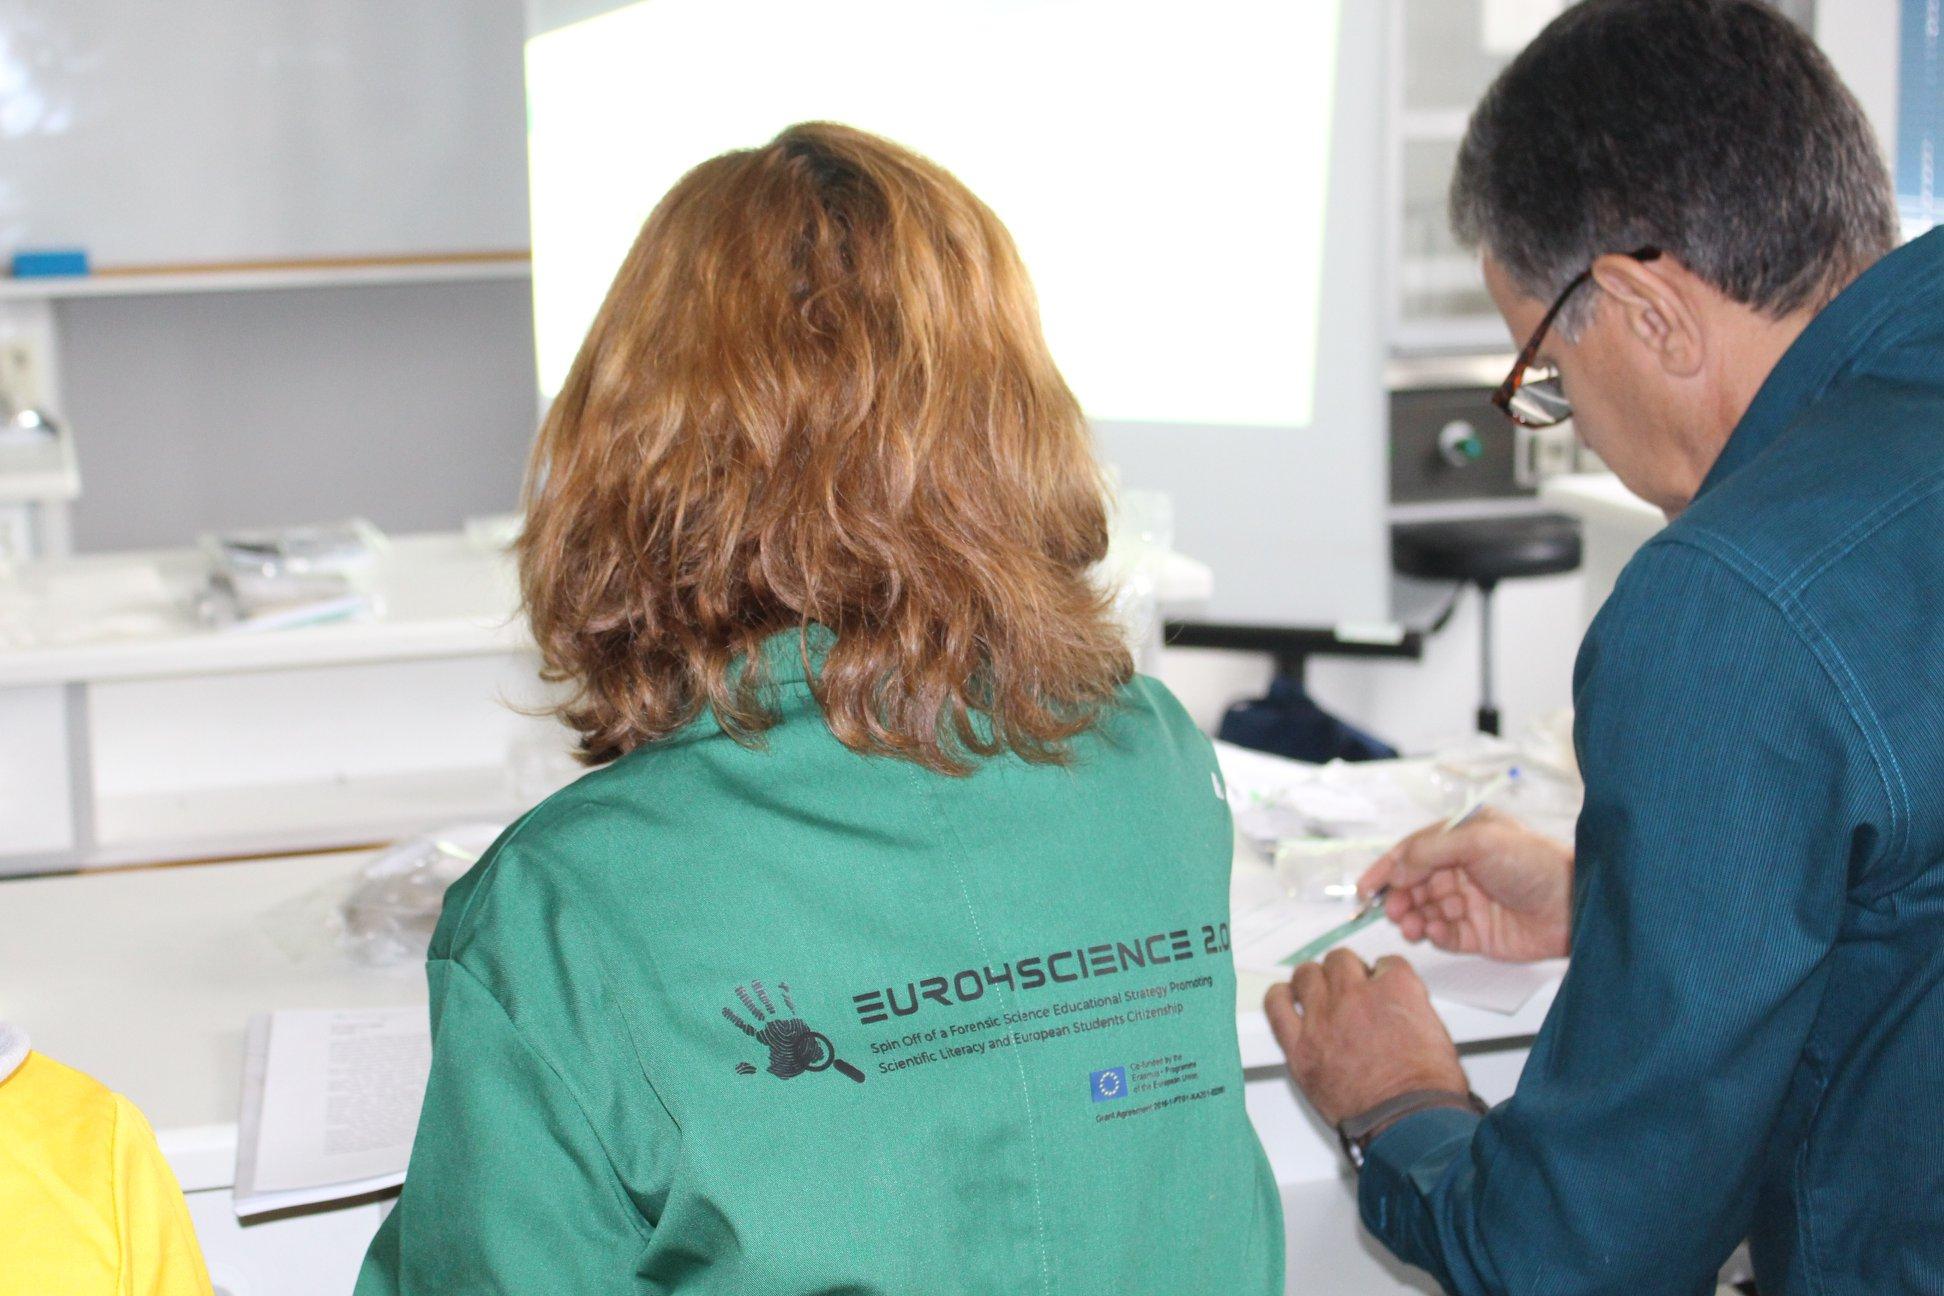 Euro4Science2.0 Workshop in Greece